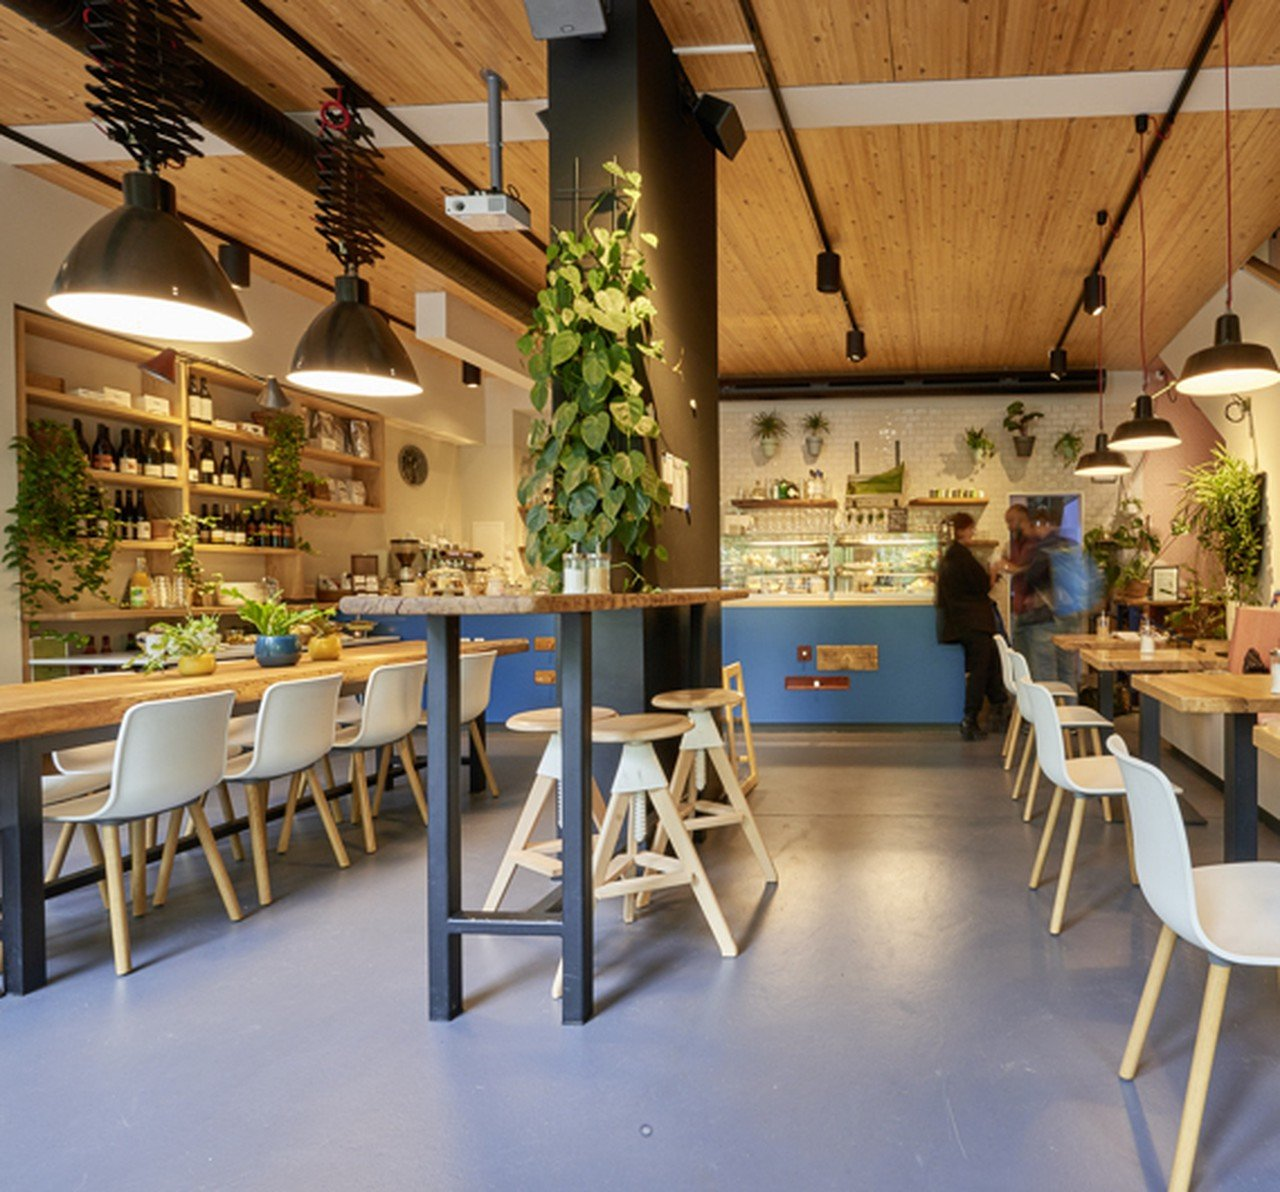 Berlin Workshopräume Restaurant Cafe/Bistro kreuz + kümmel image 5